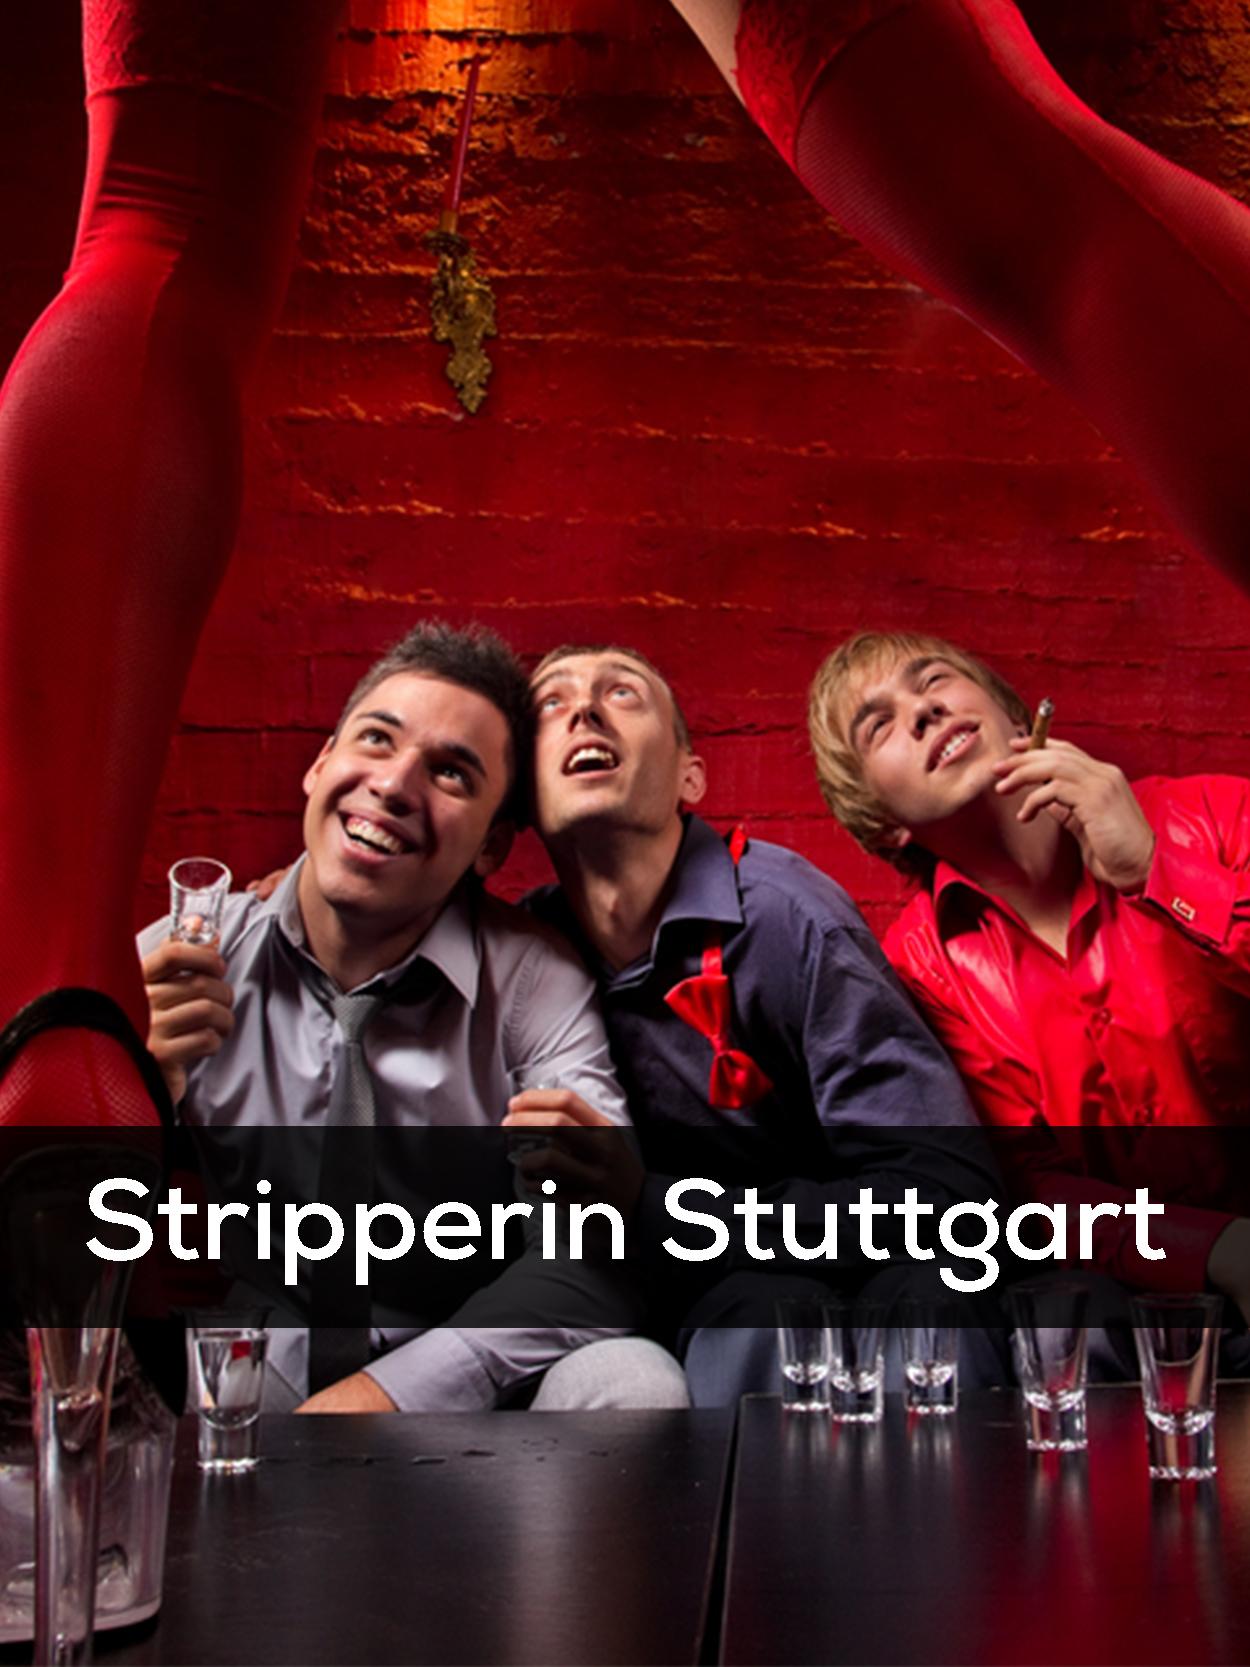 Stripperin Stuttgart